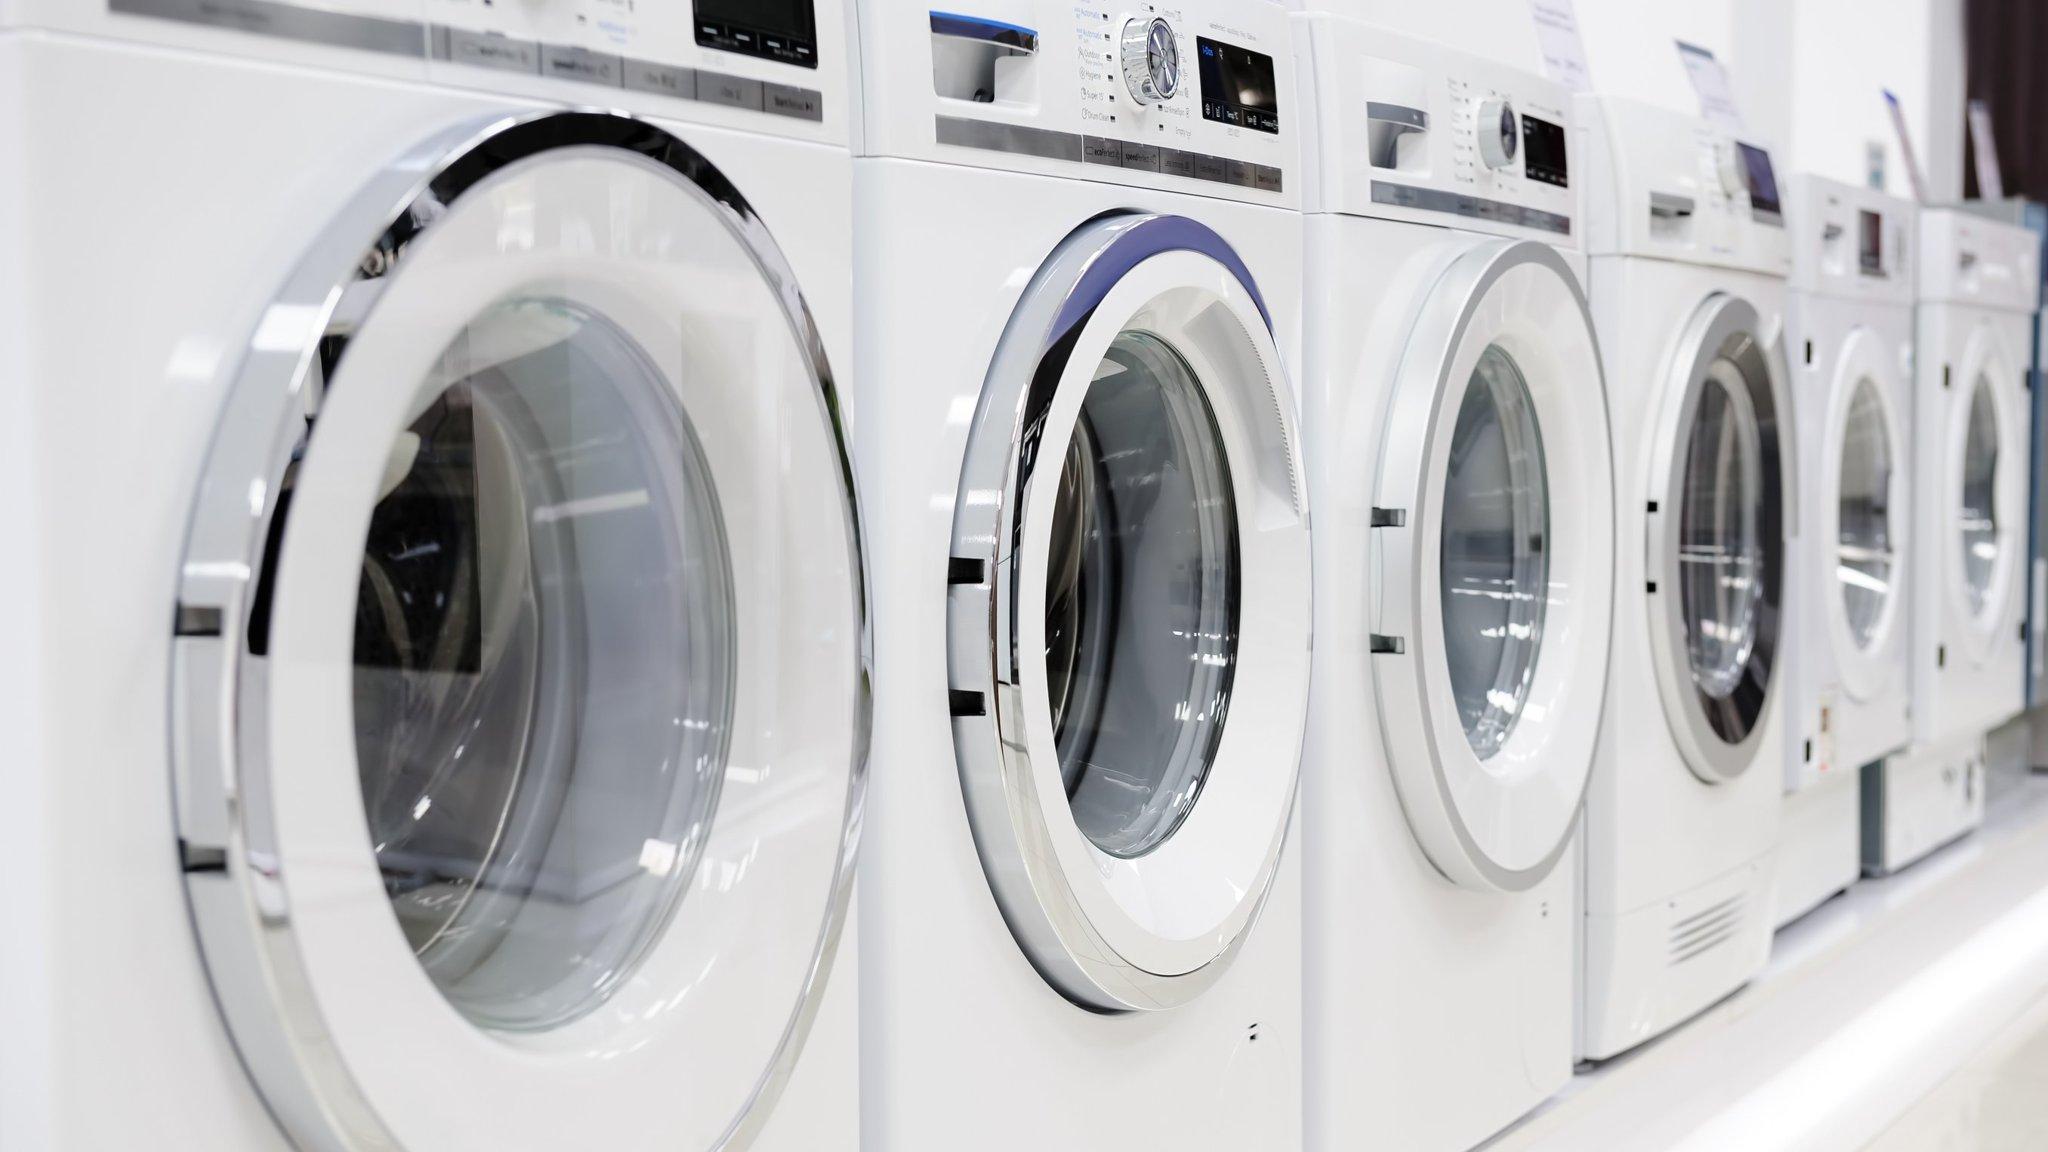 Laundry Room Sign Uk